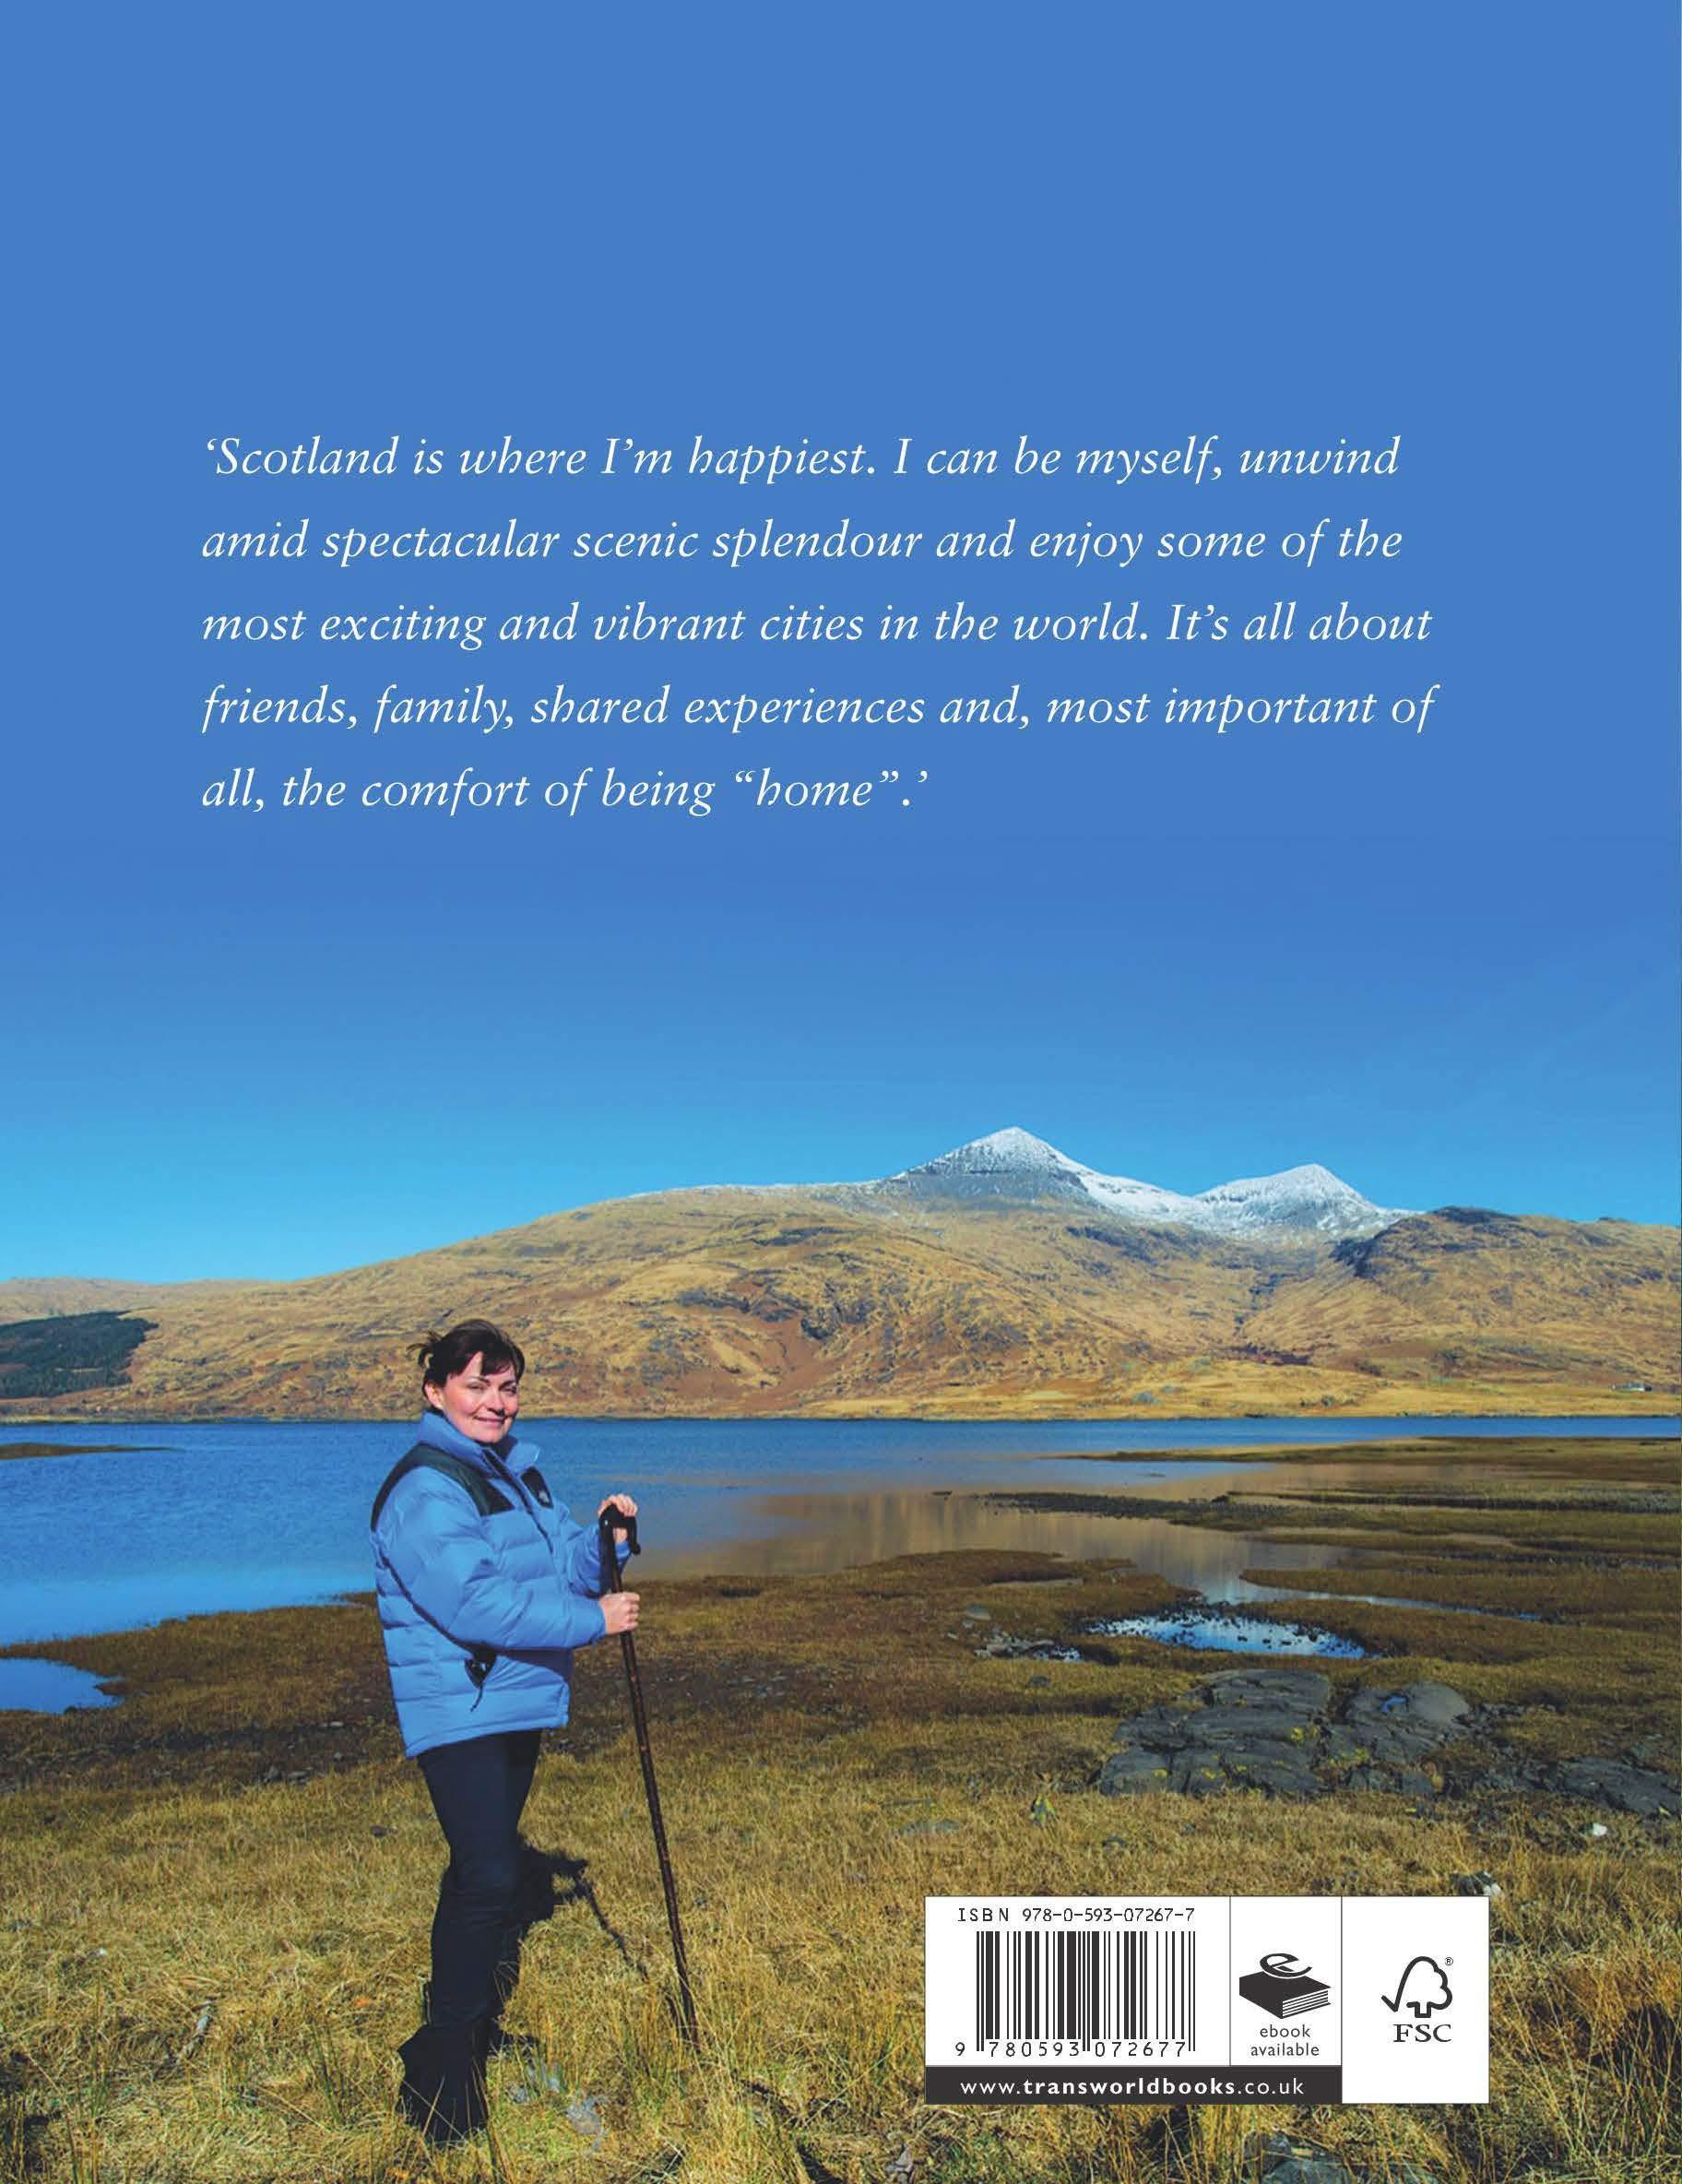 Lorraine Kellys Scotland: Amazon.es: Lorraine Kelly: Libros en idiomas extranjeros